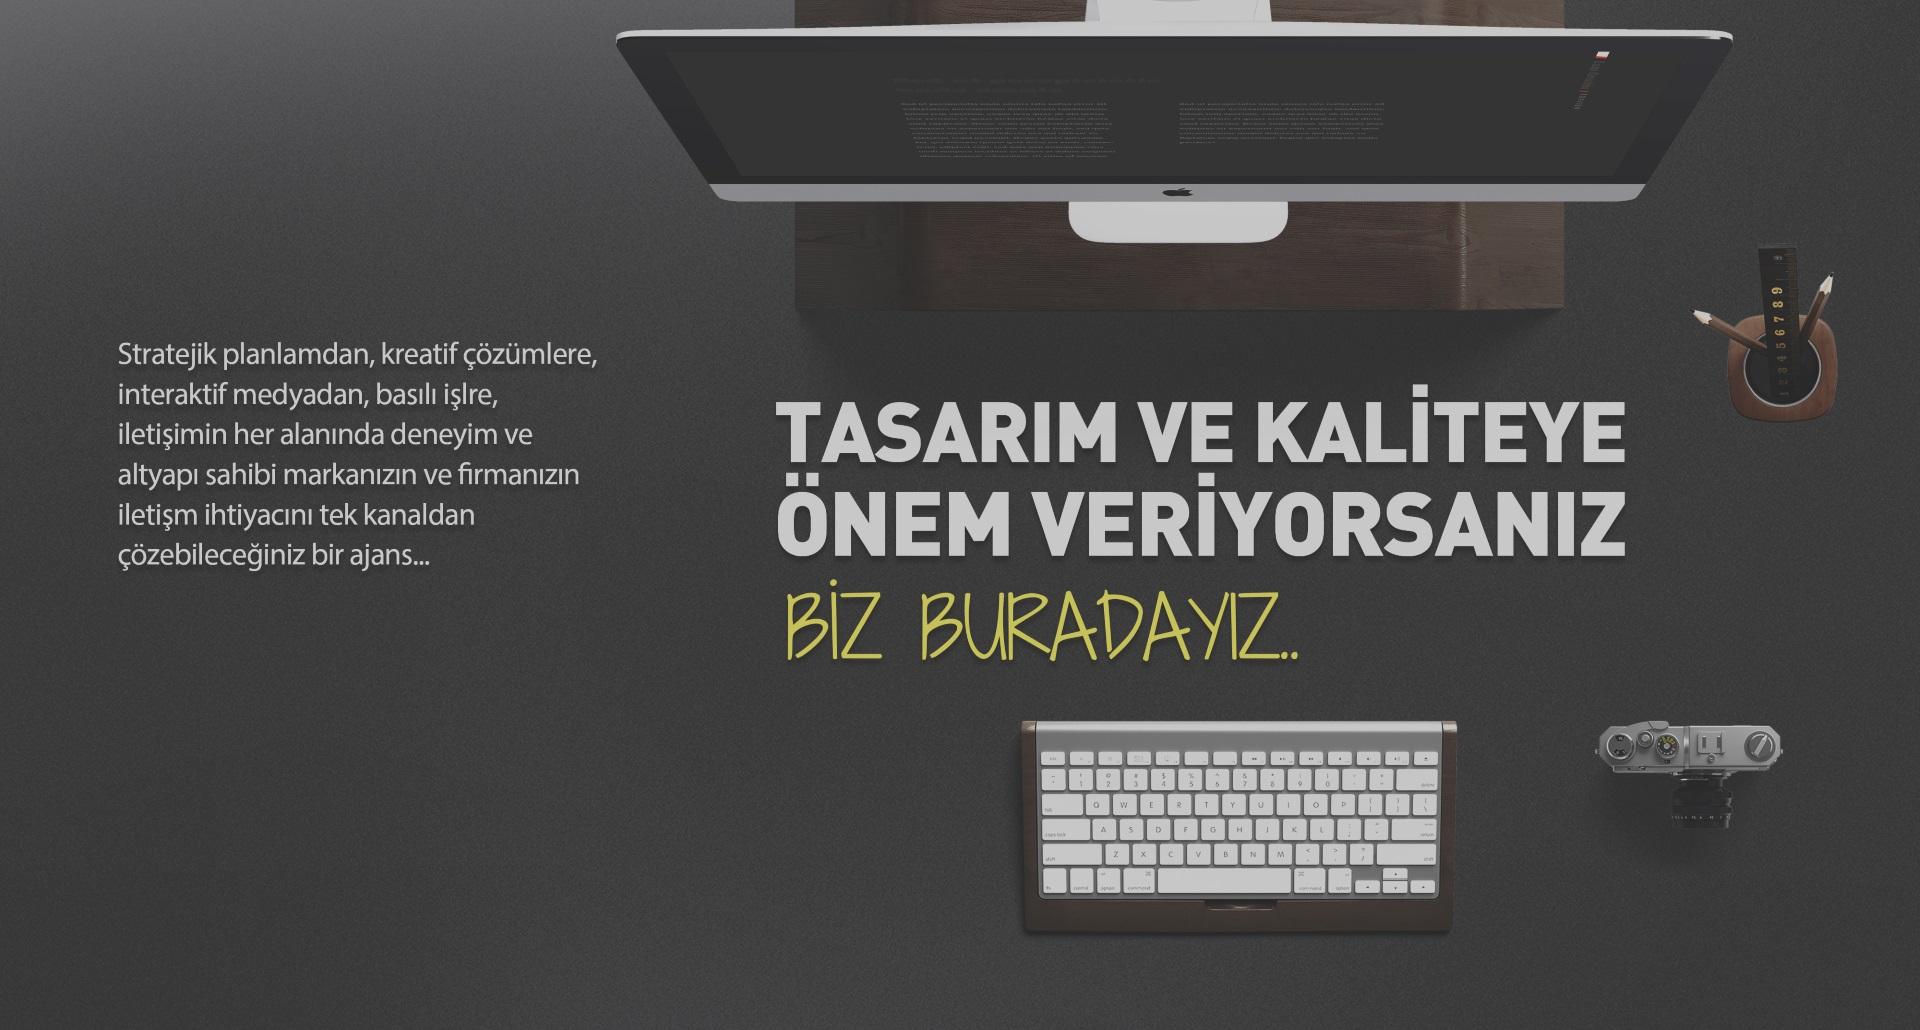 Dalgıç reklam